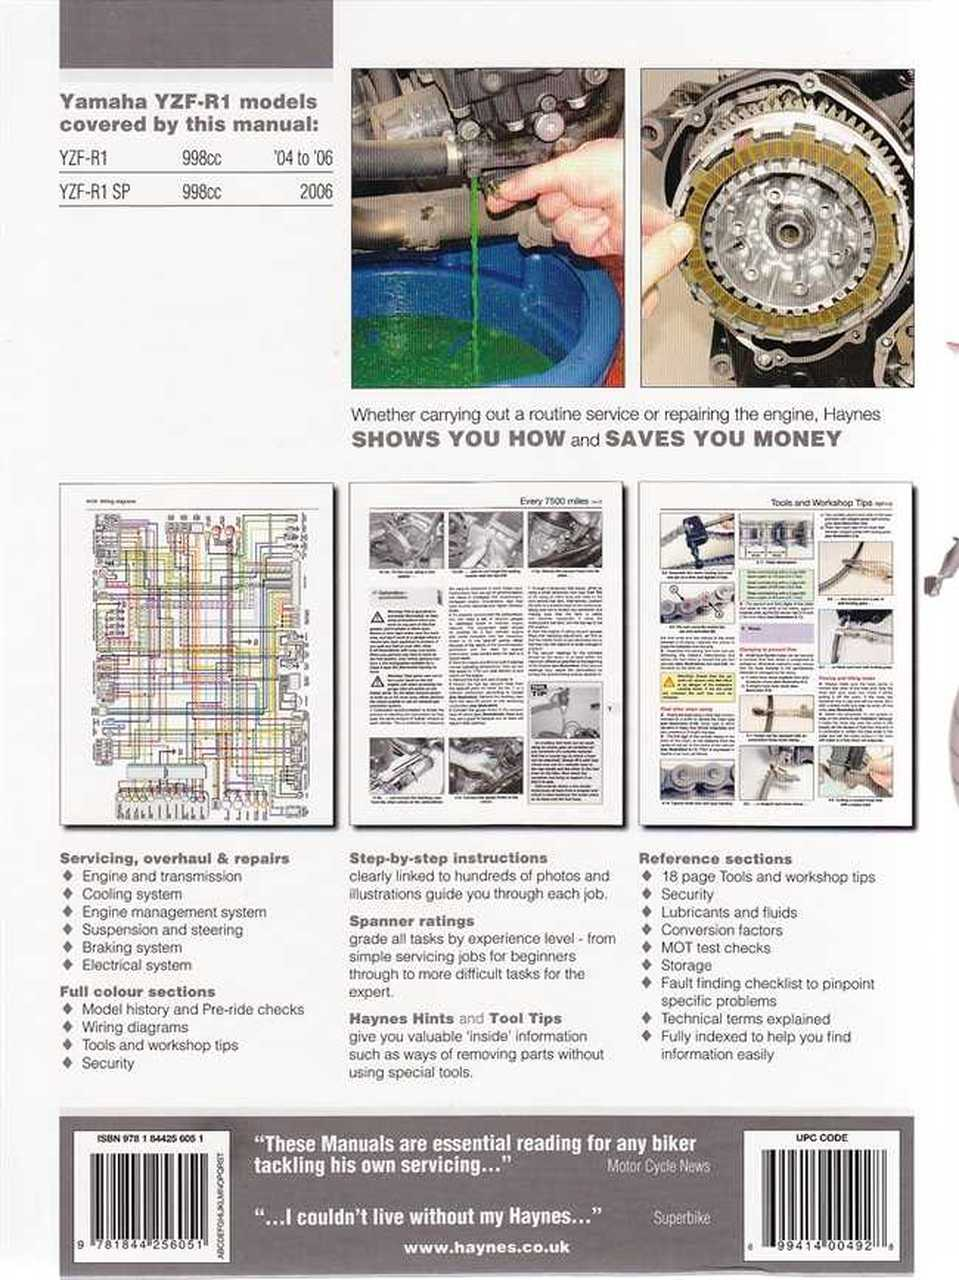 Bm 4622 2006 Yamaha Yzf R1 Wiring Diagram Download Diagram